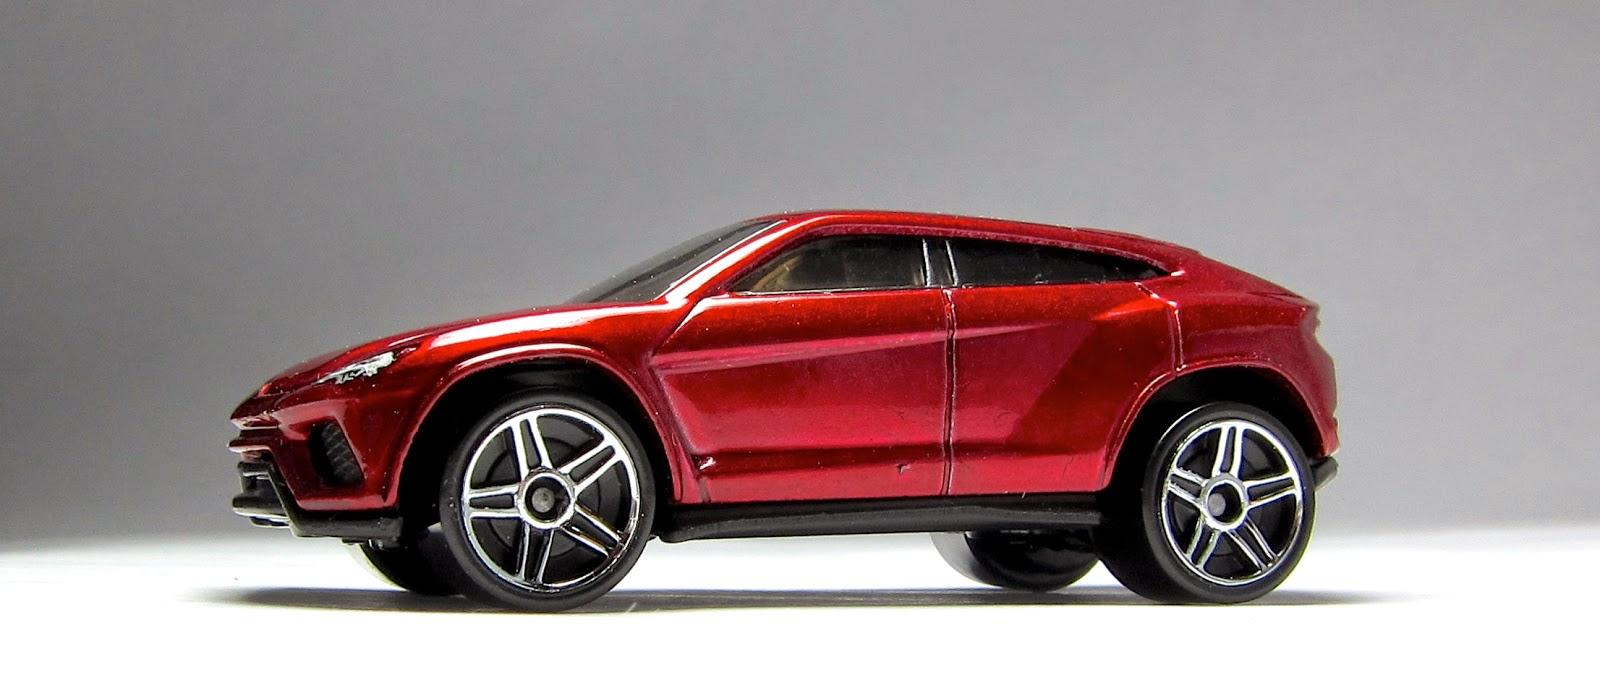 Lamborghini Hot Wheels 9 High Resolution Car Wallpaper